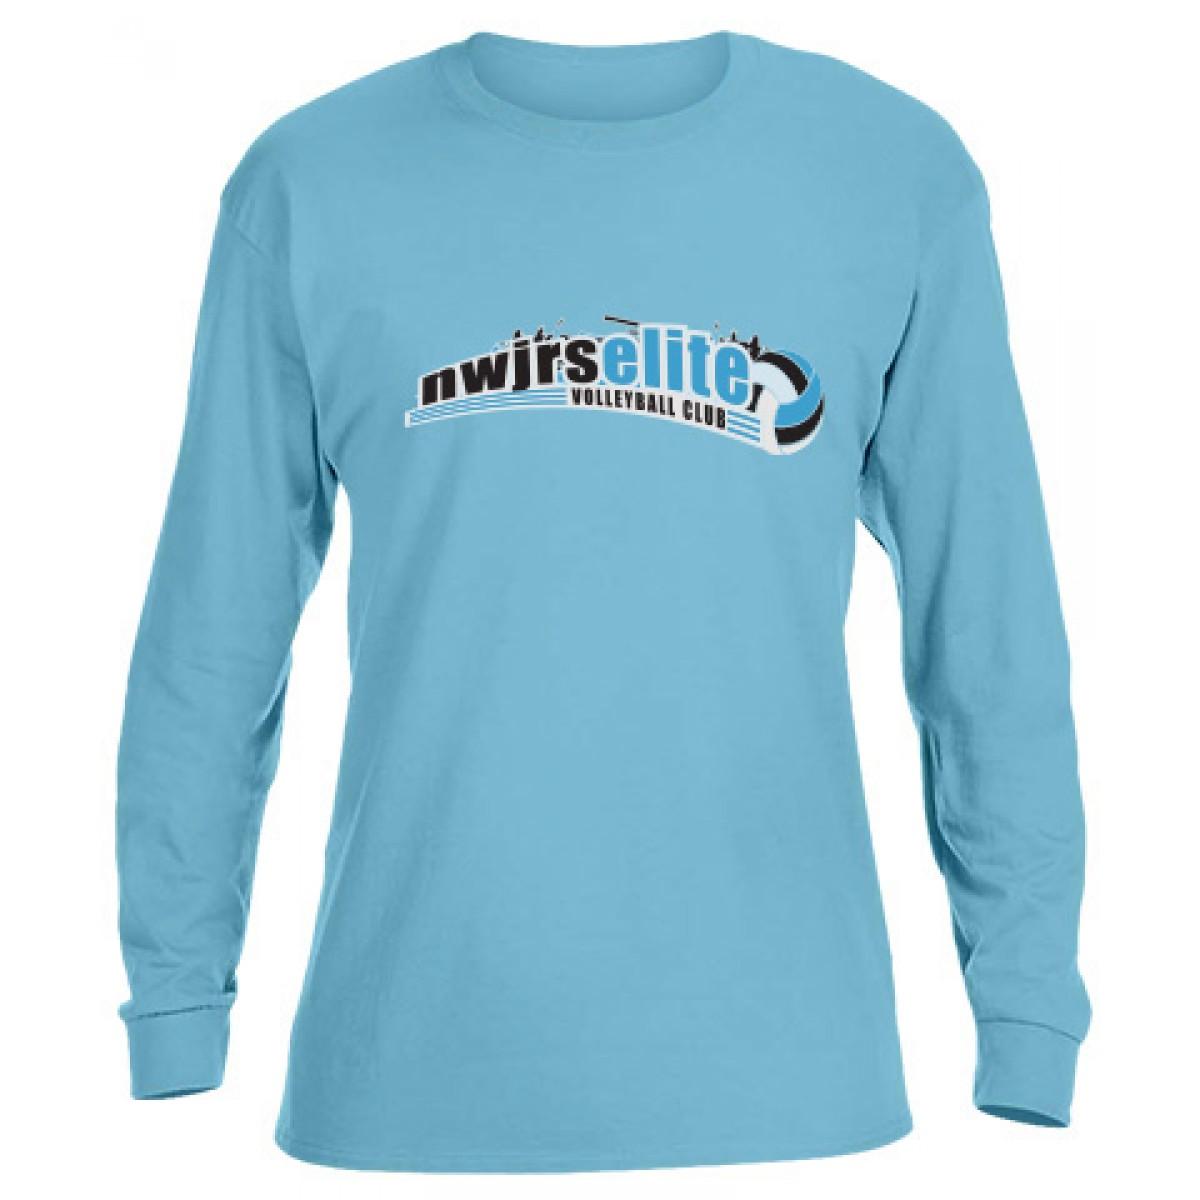 Northwest Volleyball Foundation Scholarship Program-Sky Blue-3XL